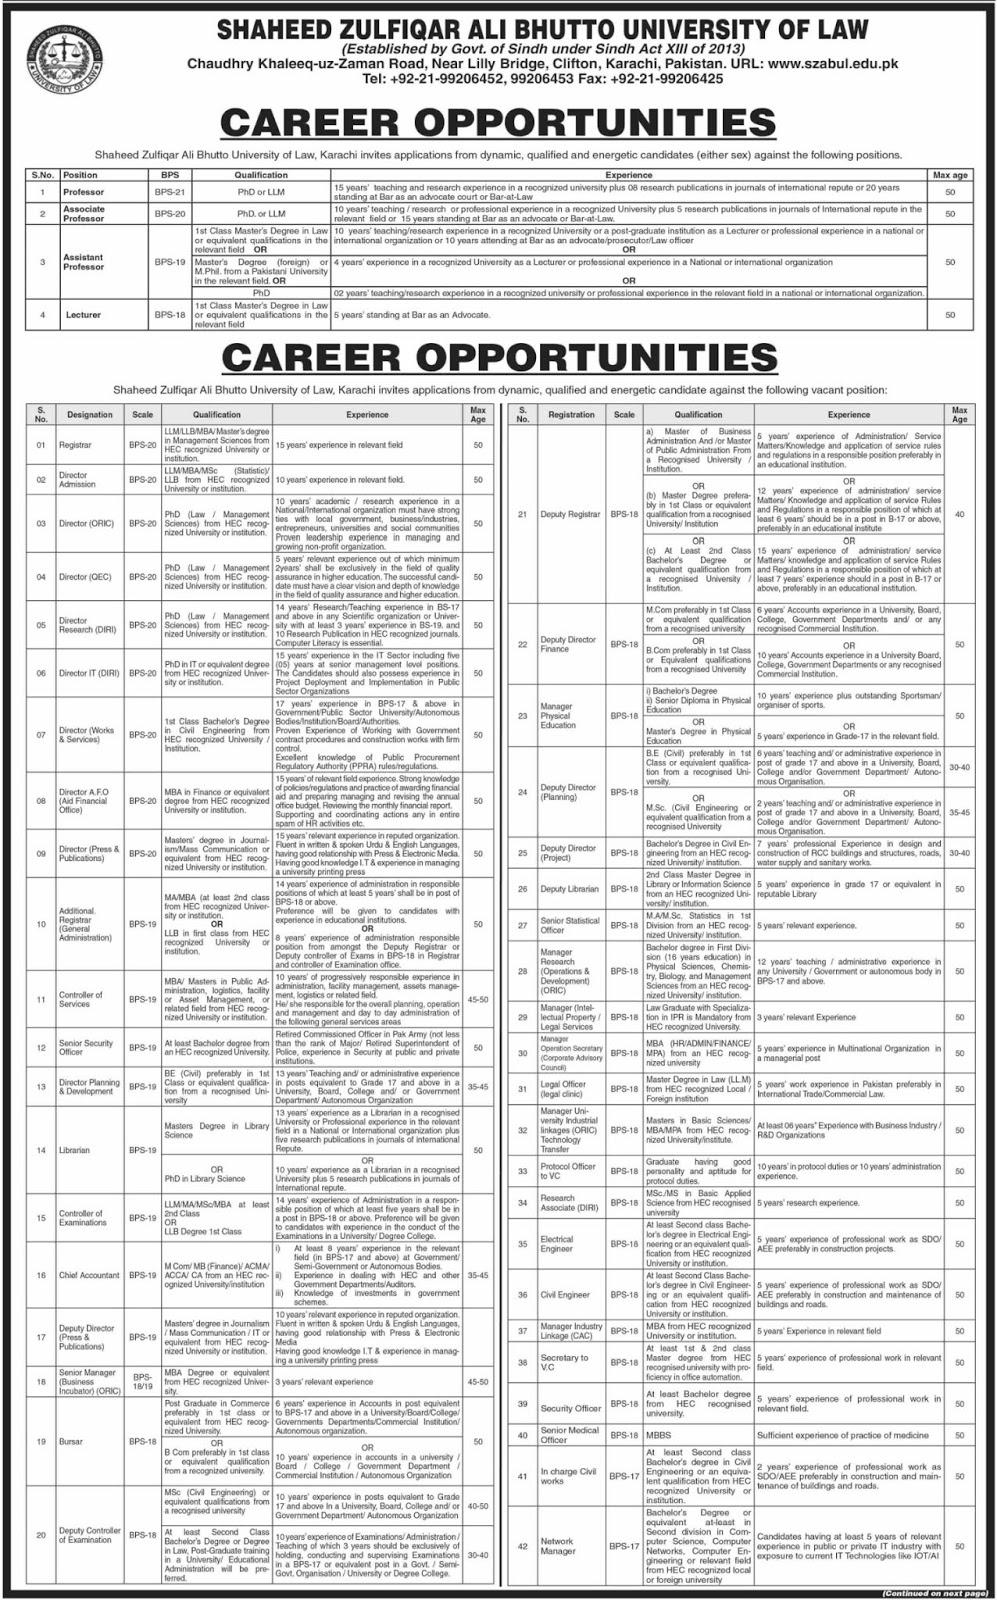 Shaheed Zulfiqar Ali Bhutto University of Law SZABUL Karachi Jobs 2019 Latest